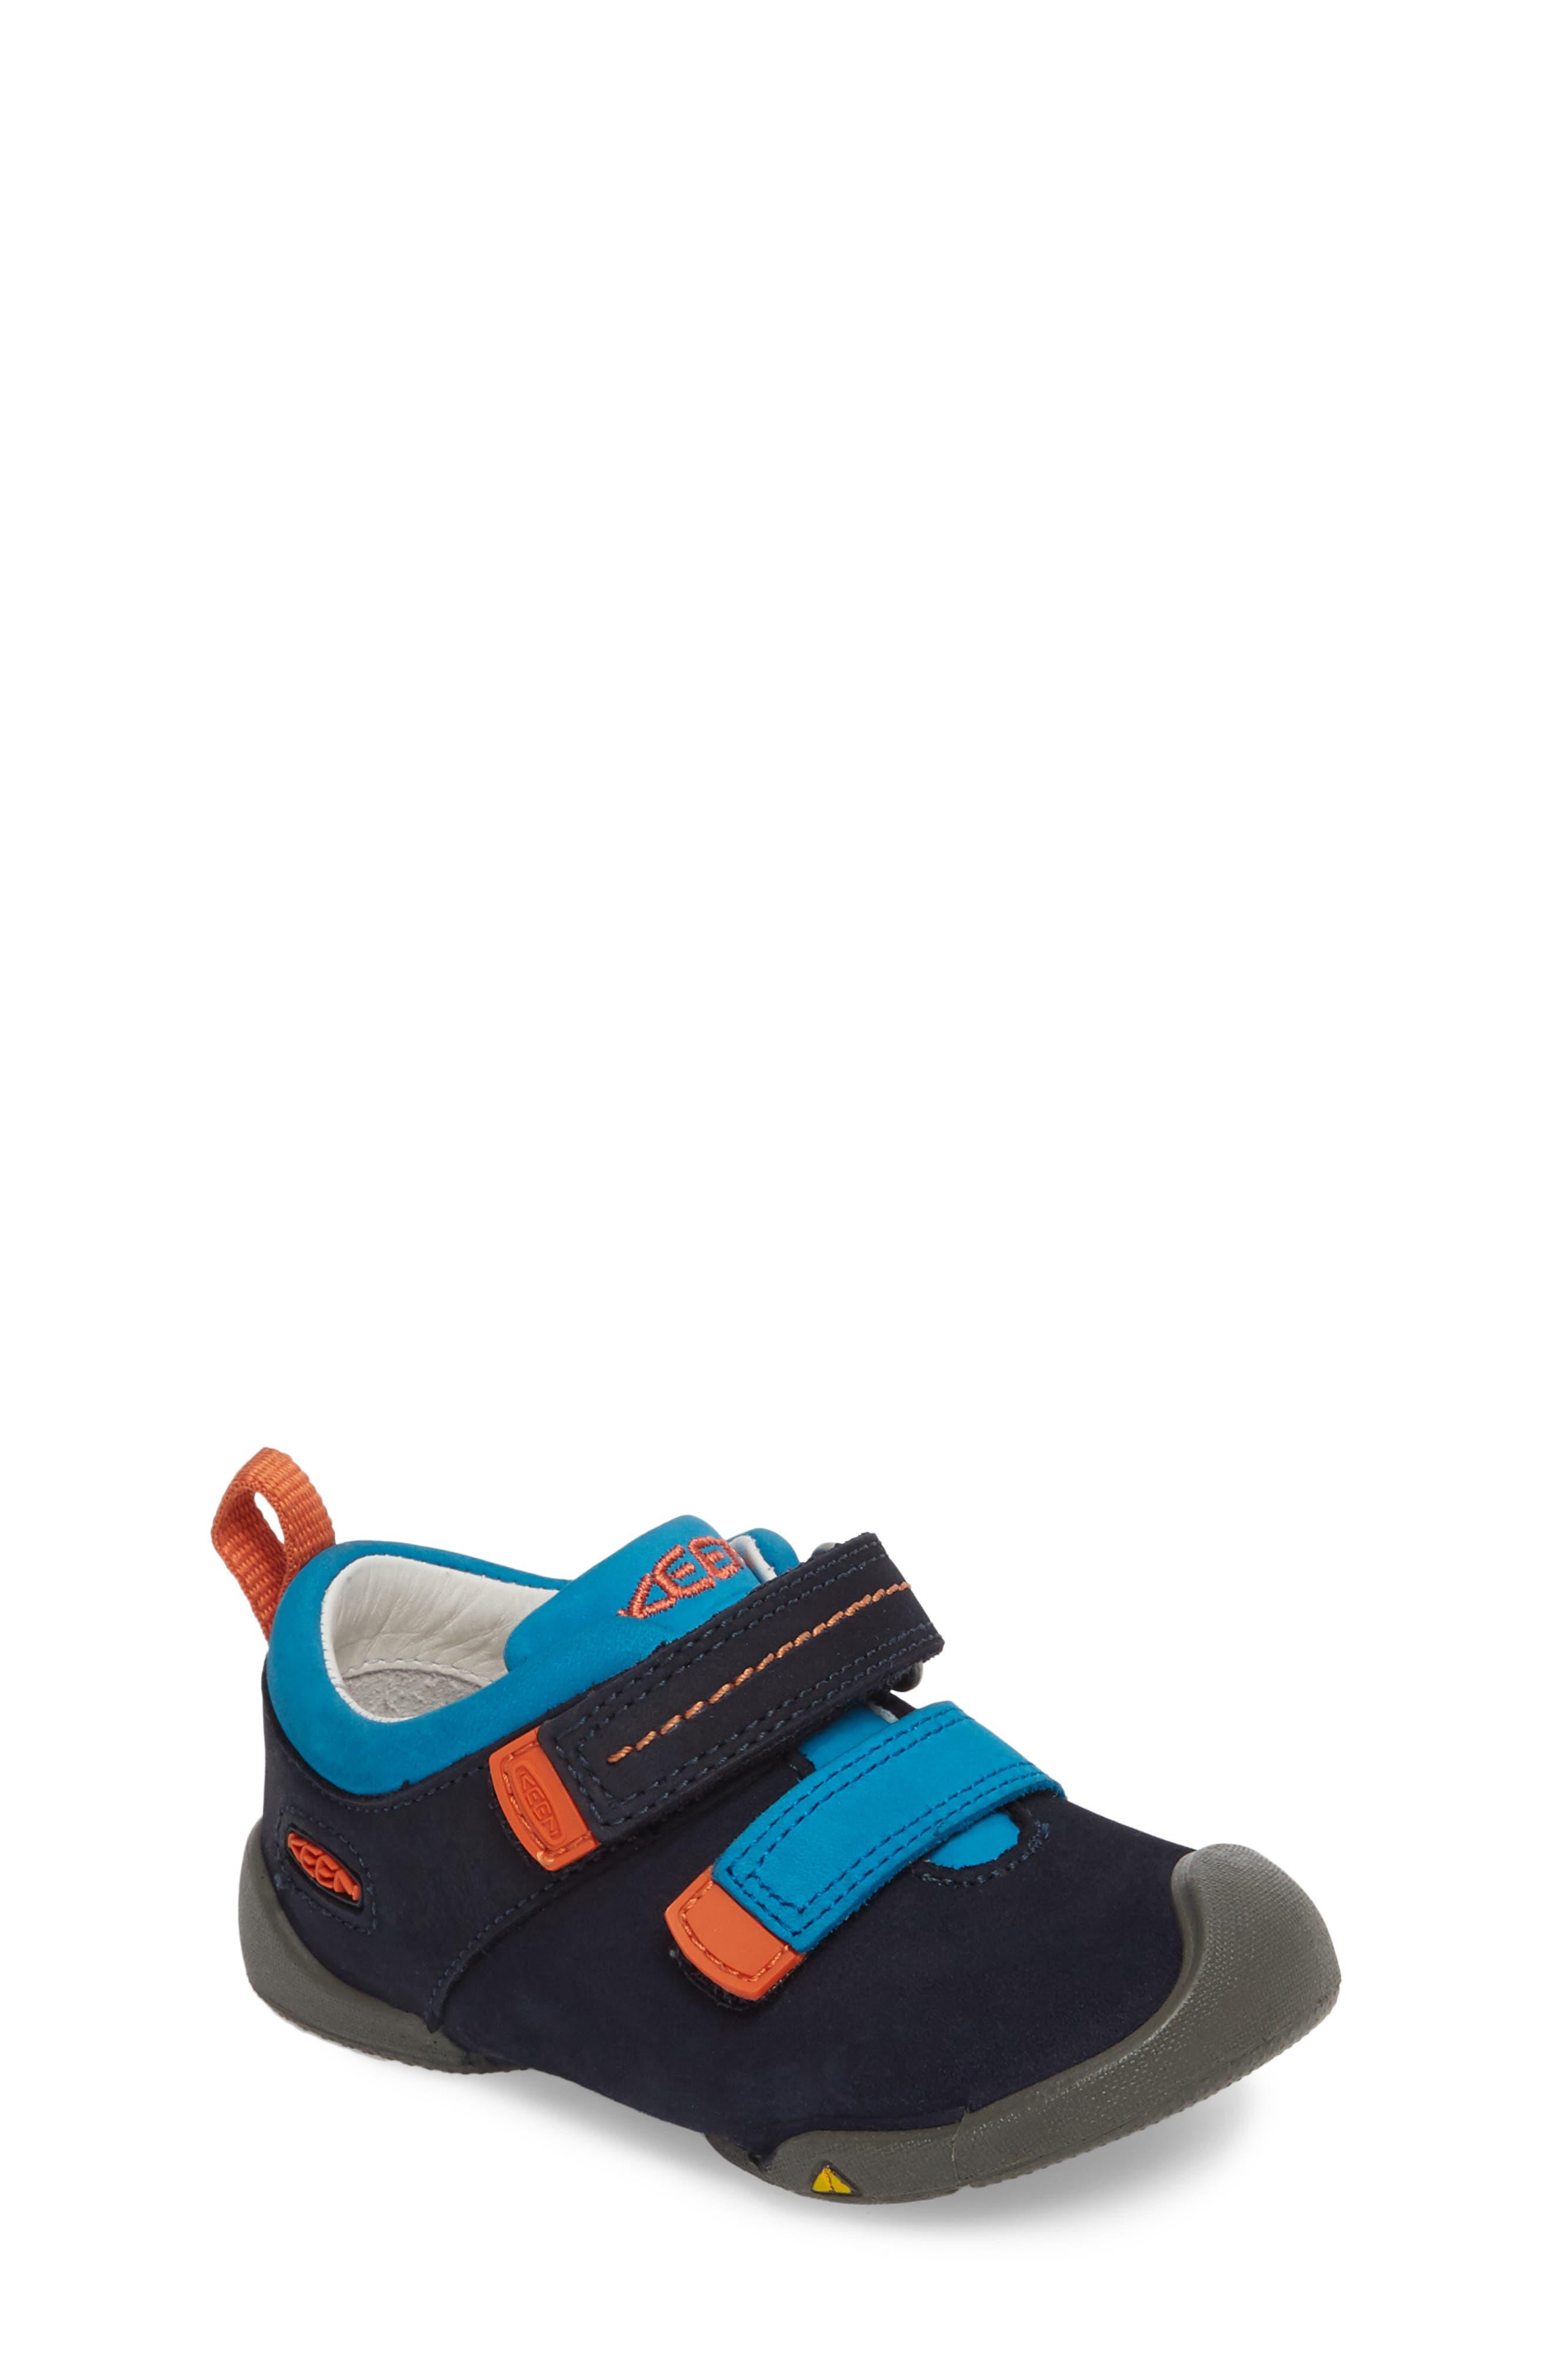 Pep Double Strap-T Sneaker,                         Main,                         color, Dress Blues/ Koi